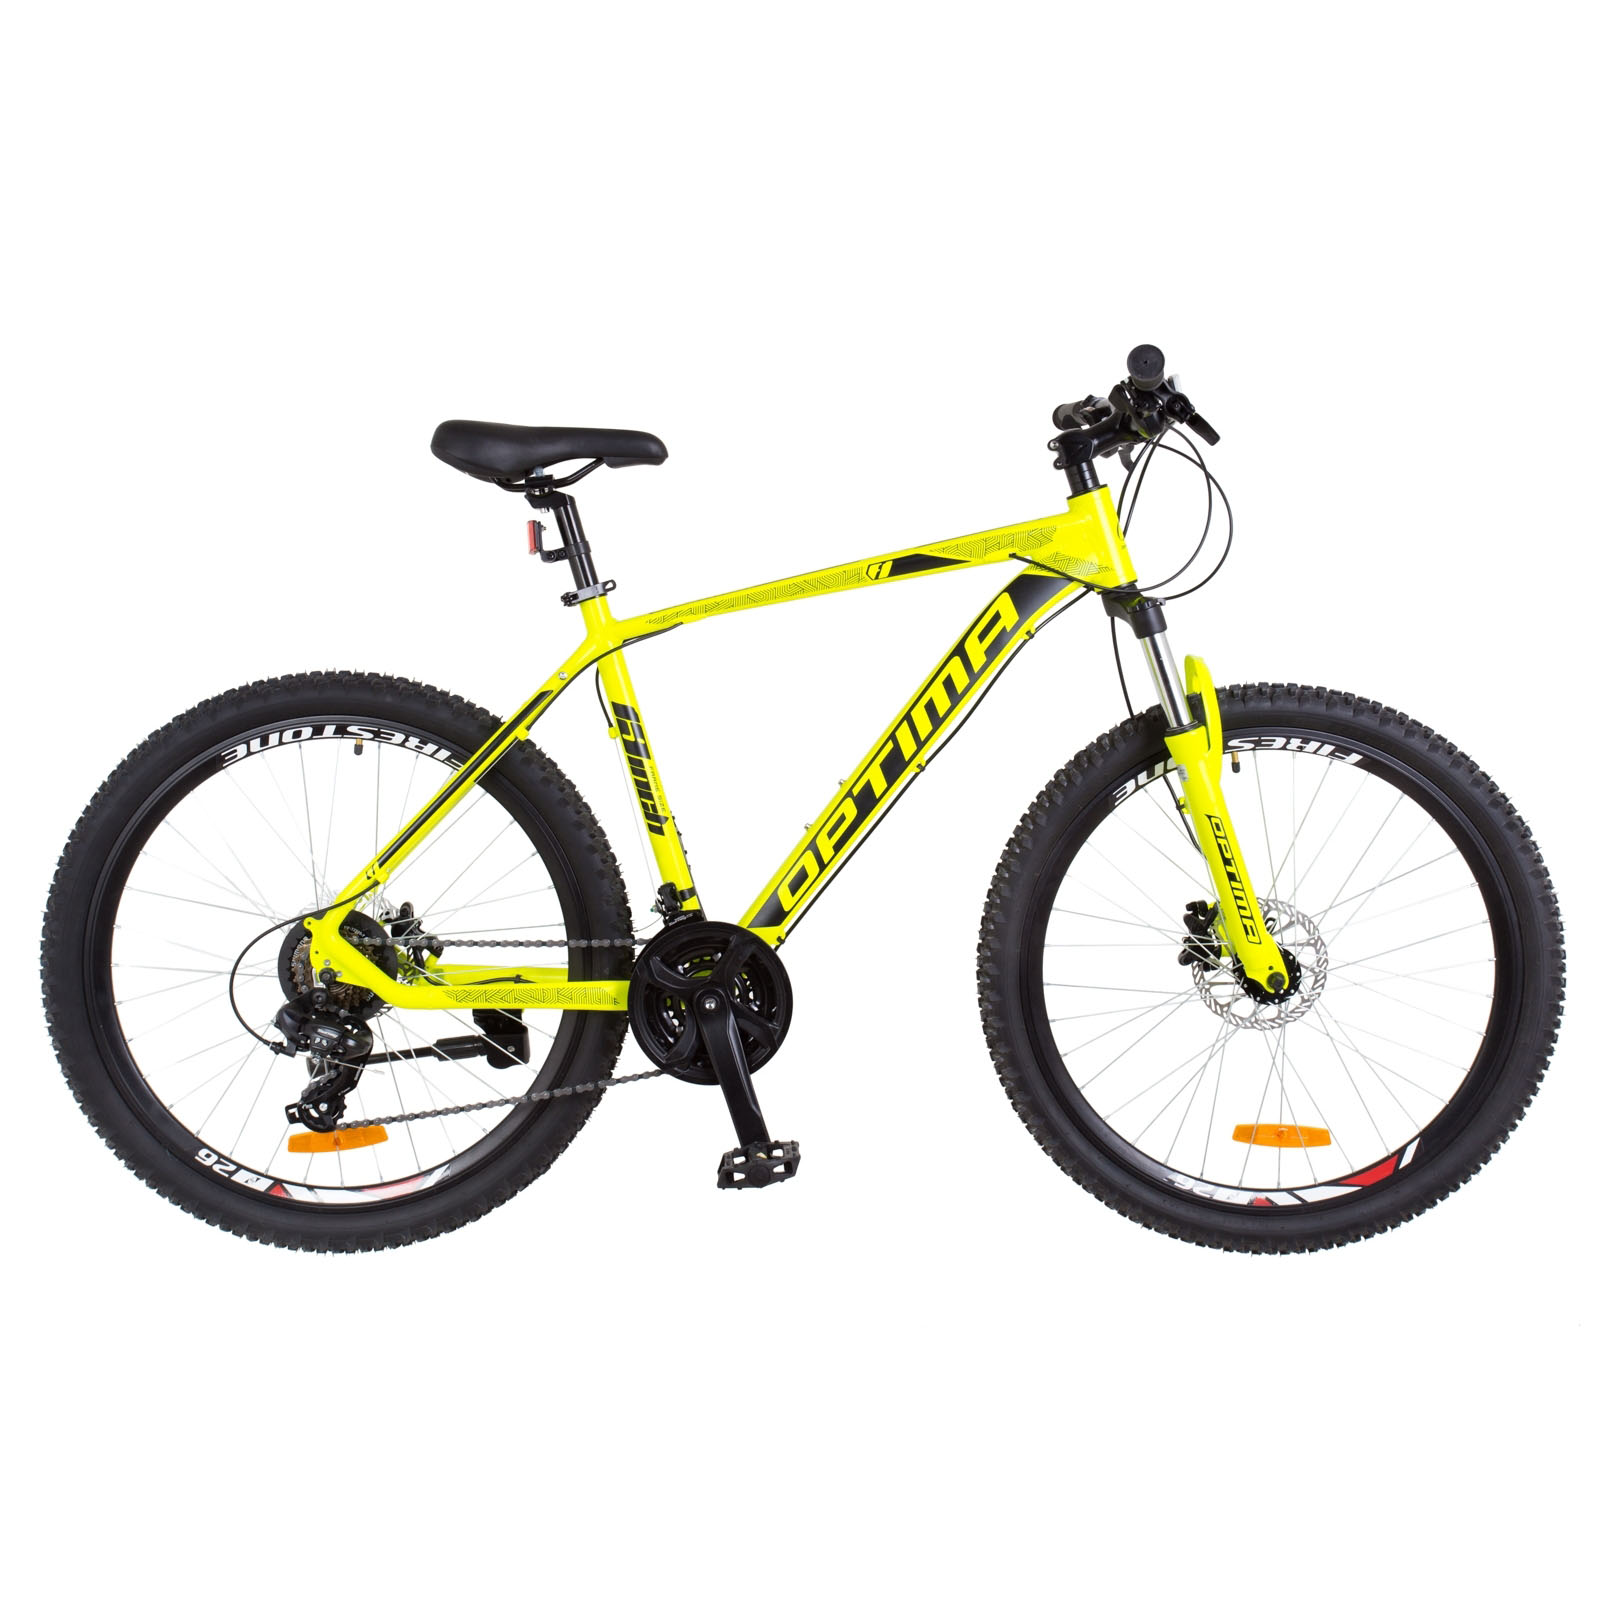 Фото Горный Велосипед 26 Optimabikes F-1 HDD 17″ неон